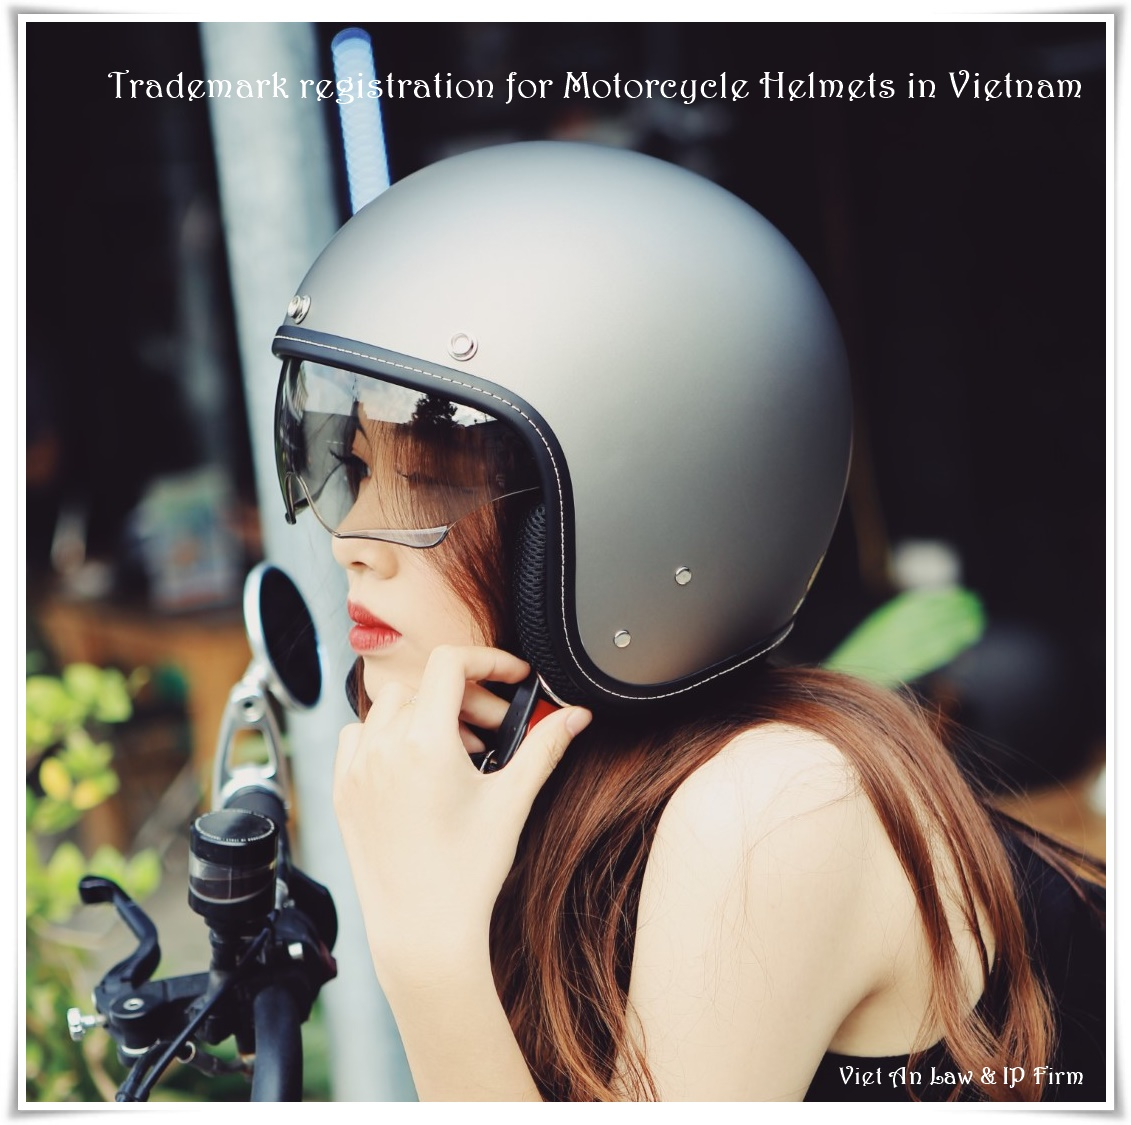 Trademark registration for Motorcycle Helmets in Vietnam